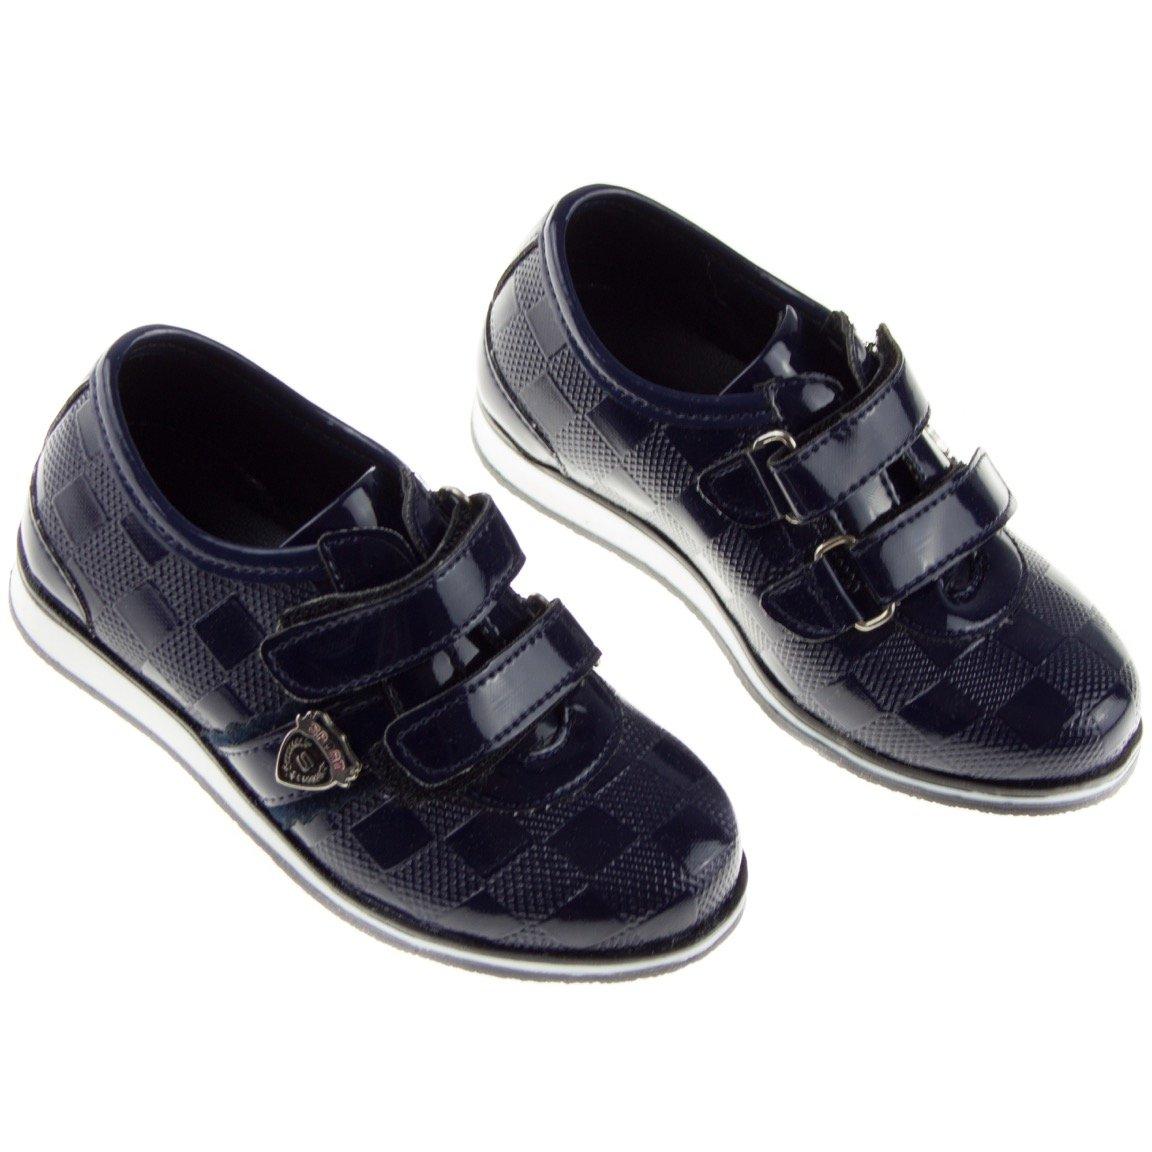 Harli By Sen παιδικά παπούτσια «Exceptional»